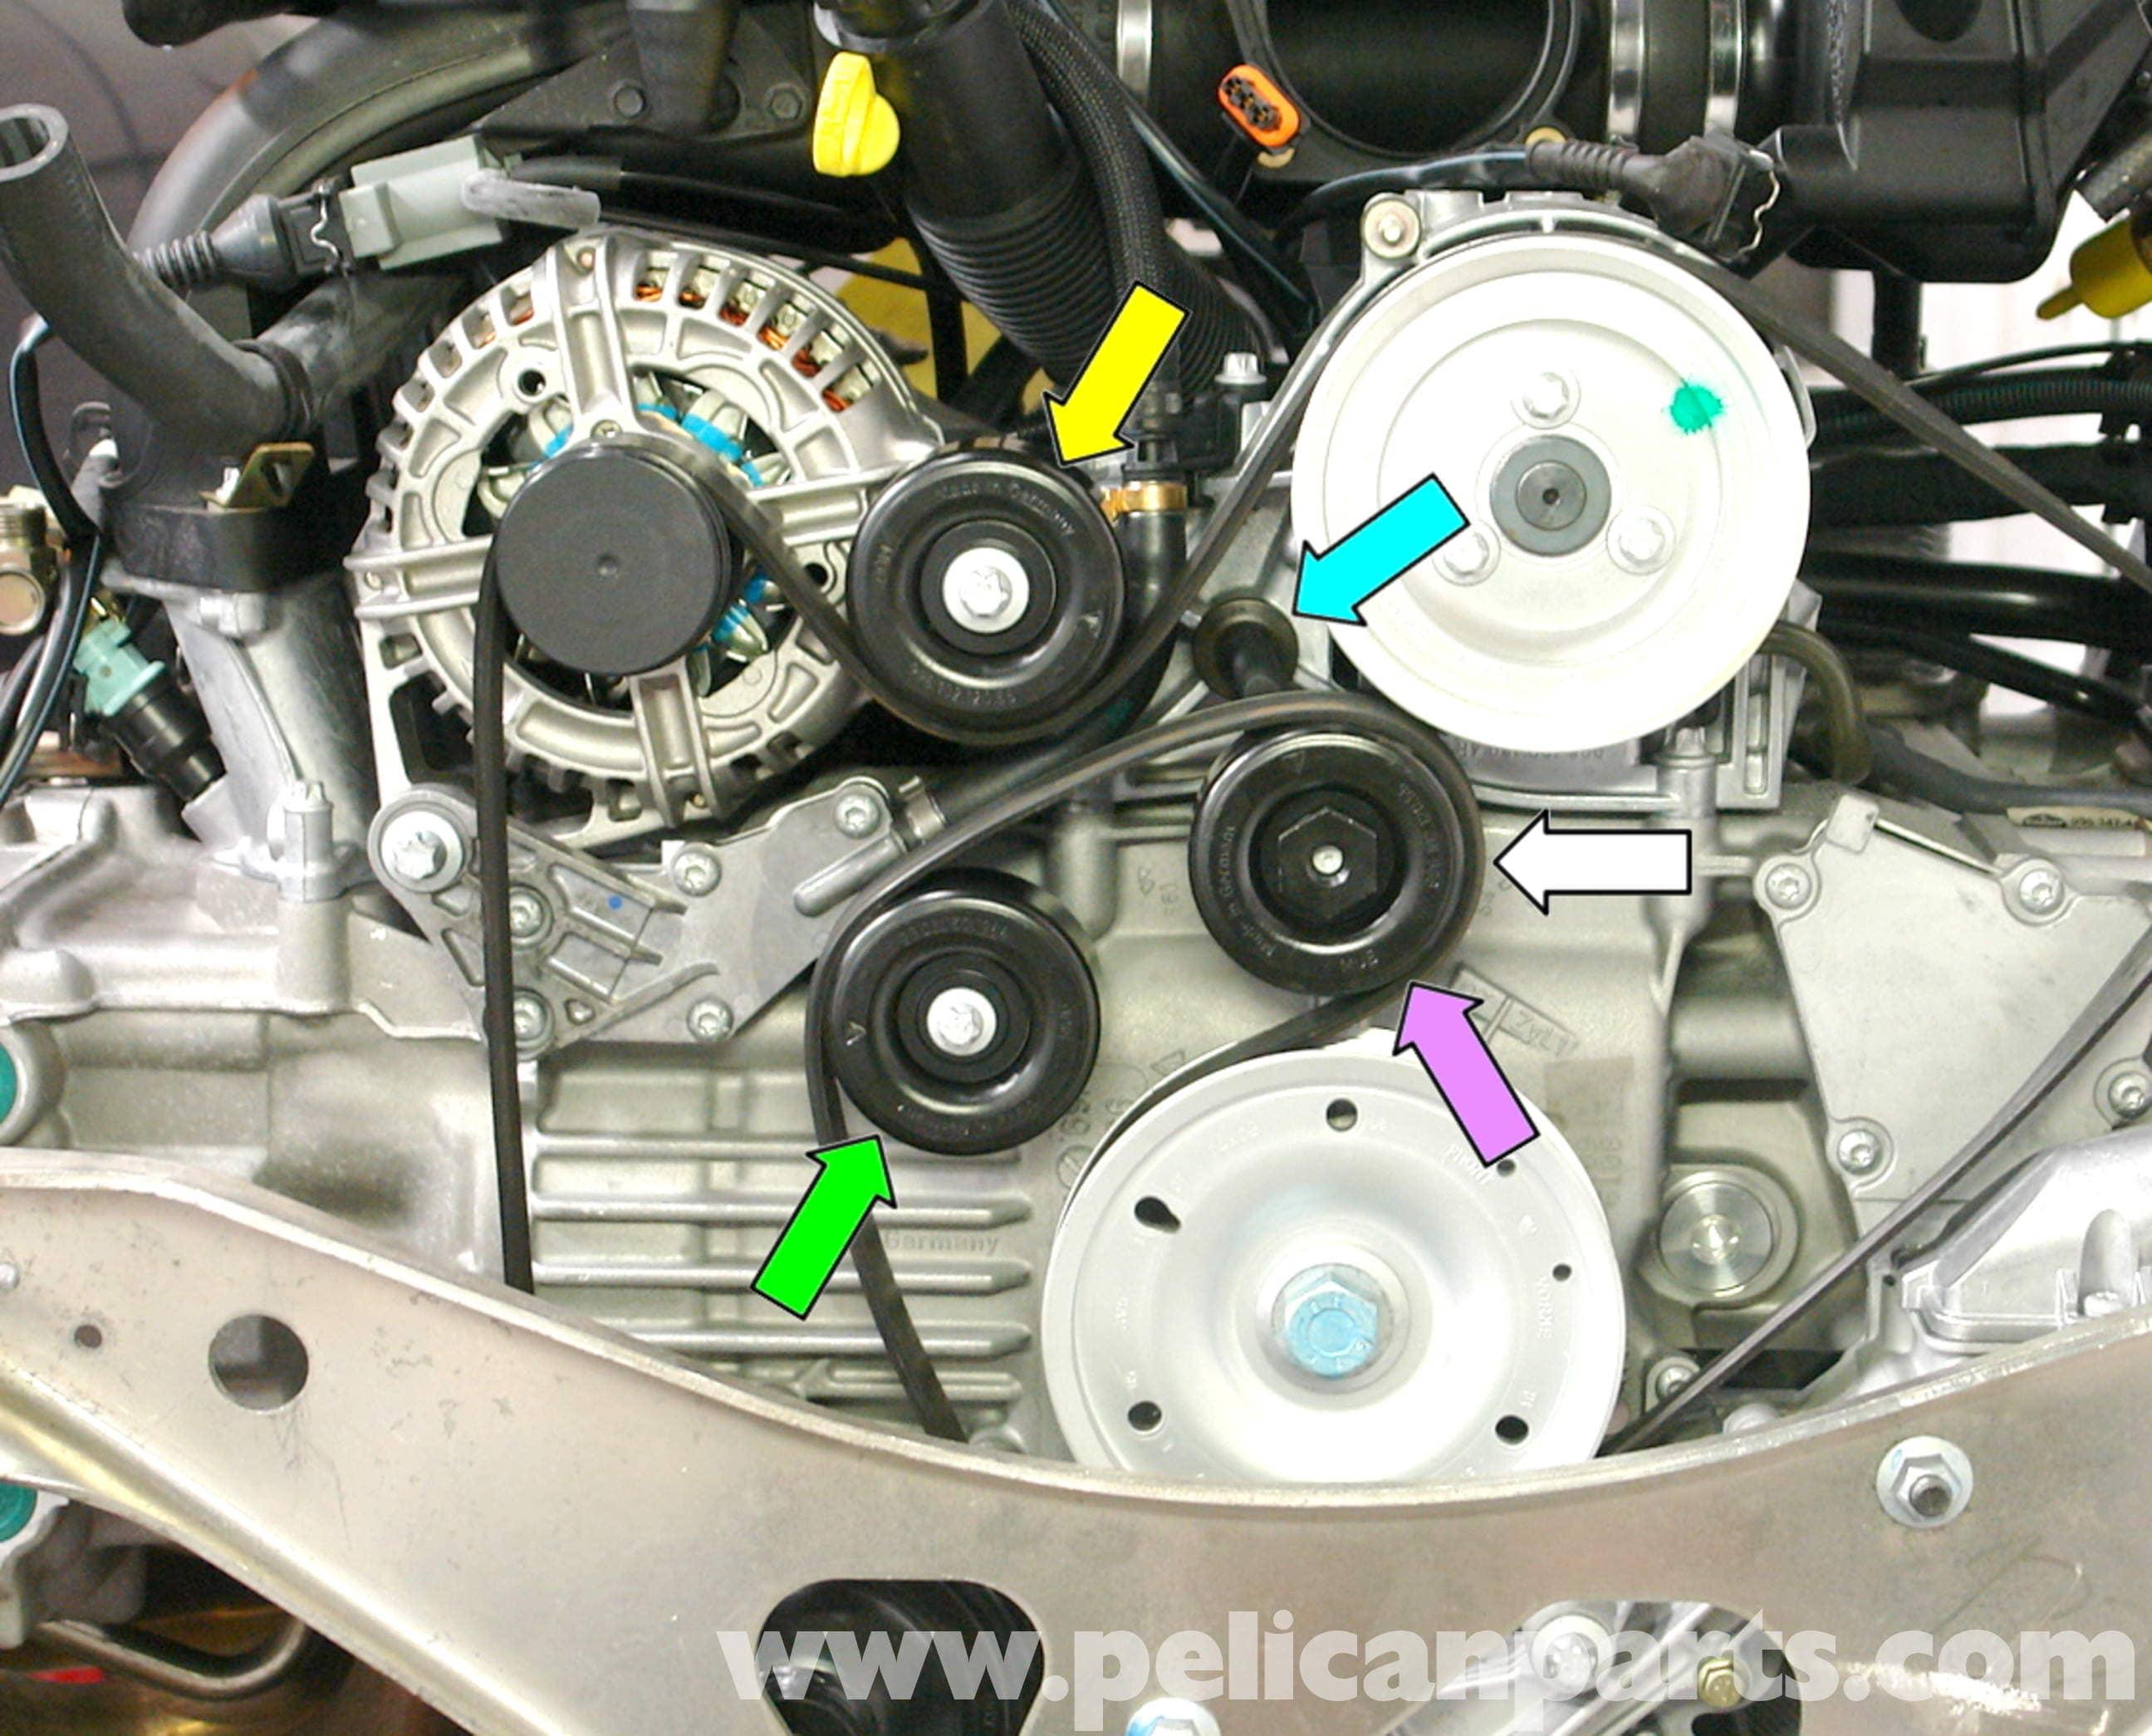 Porsche 911 Timing Belt Diagram Start Building A Wiring Carrera Tensioner Replacement 996 1998 2005 Rh Pelicanparts Com Flat 6